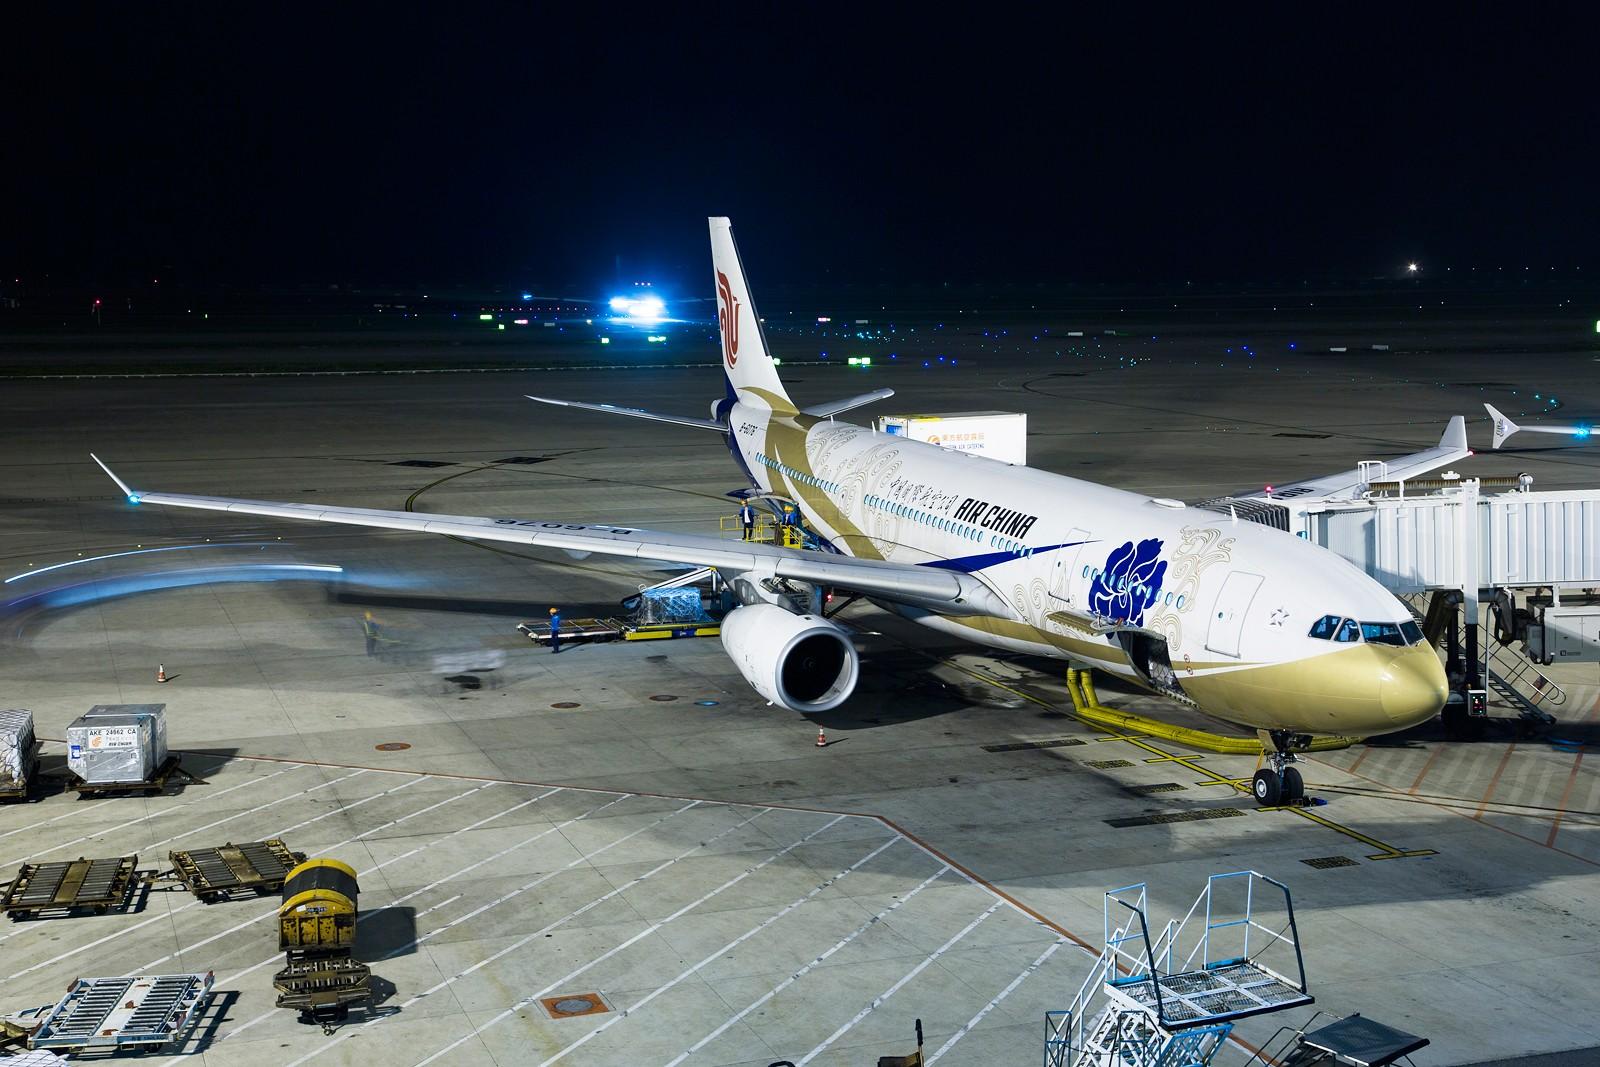 "Re:[原创]【PVG】**********浦东T2""内场党"",夜景来几张[1600*1067]********** AIRBUS A330-200 B-6076 中国上海浦东国际机场"